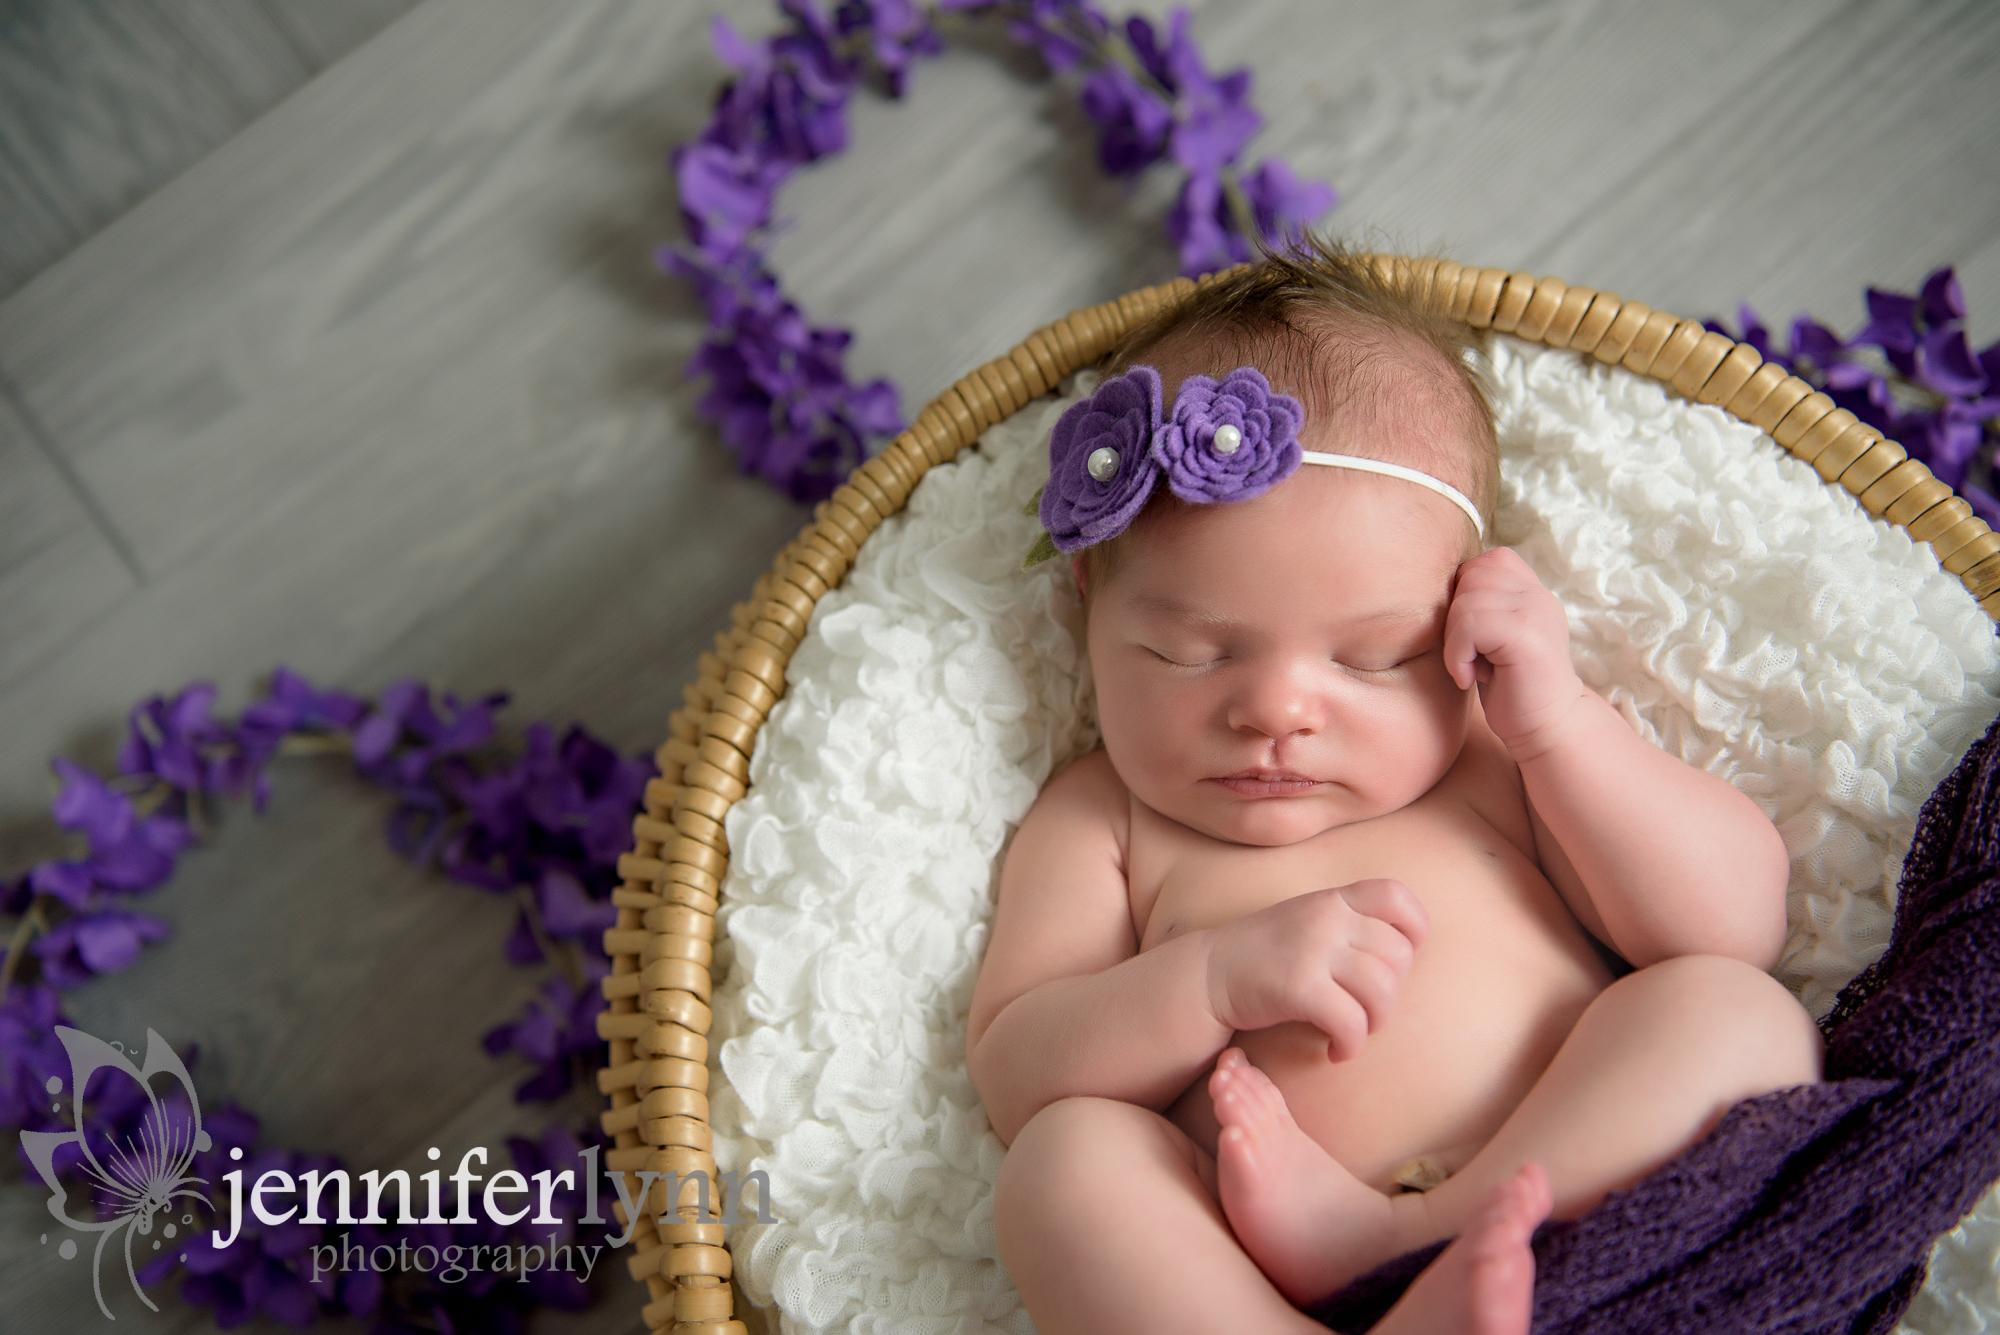 Newborn Girl Basket Purple Wrap and Flowers